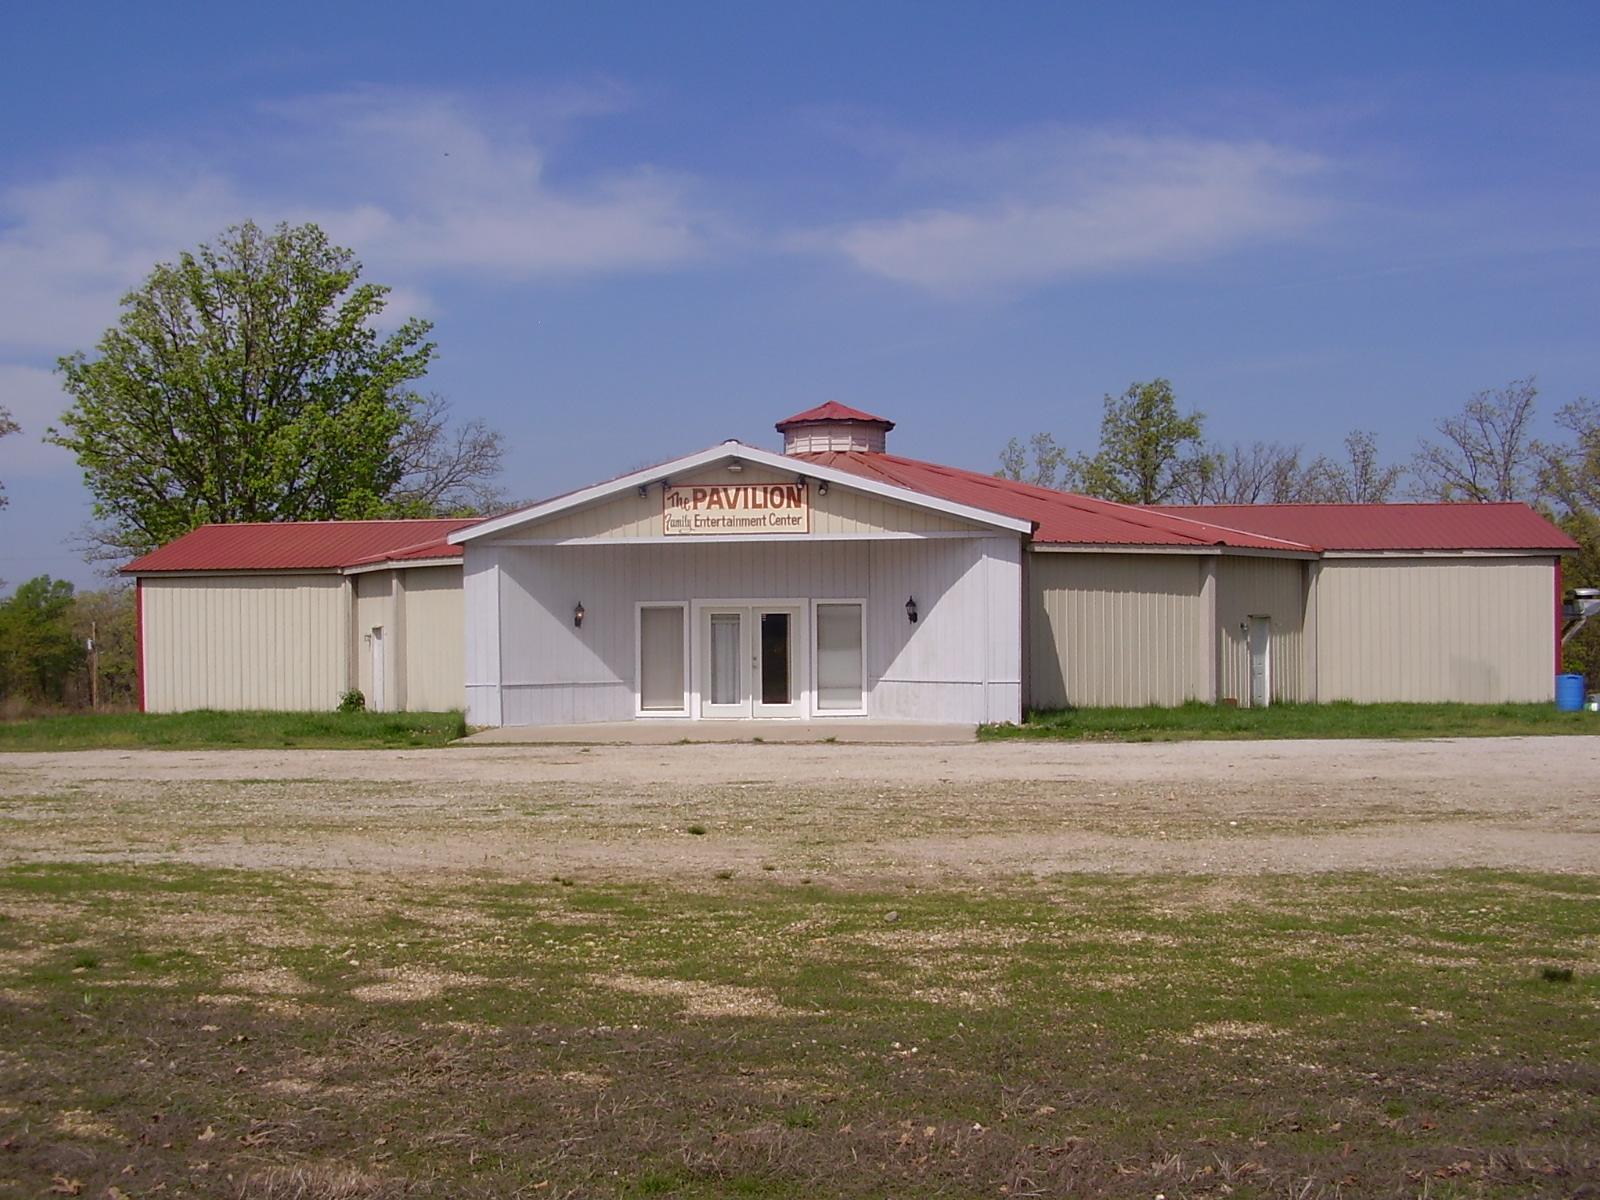 52 Pavilion Circle, Macks Creek, Missouri 65786